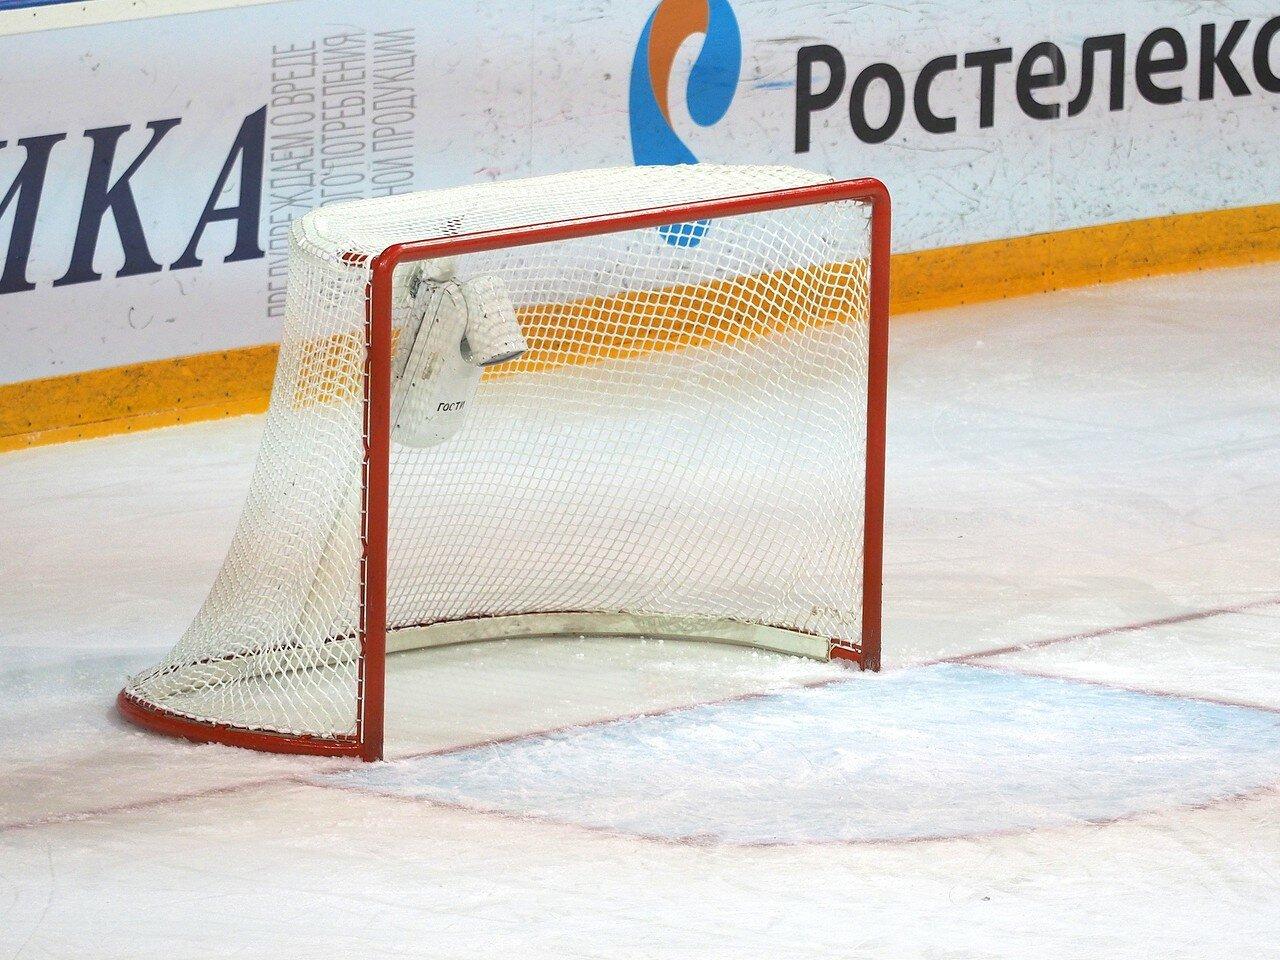 124Восток 1/2 плей-офф Металлург - Сибирь 08.03.2016